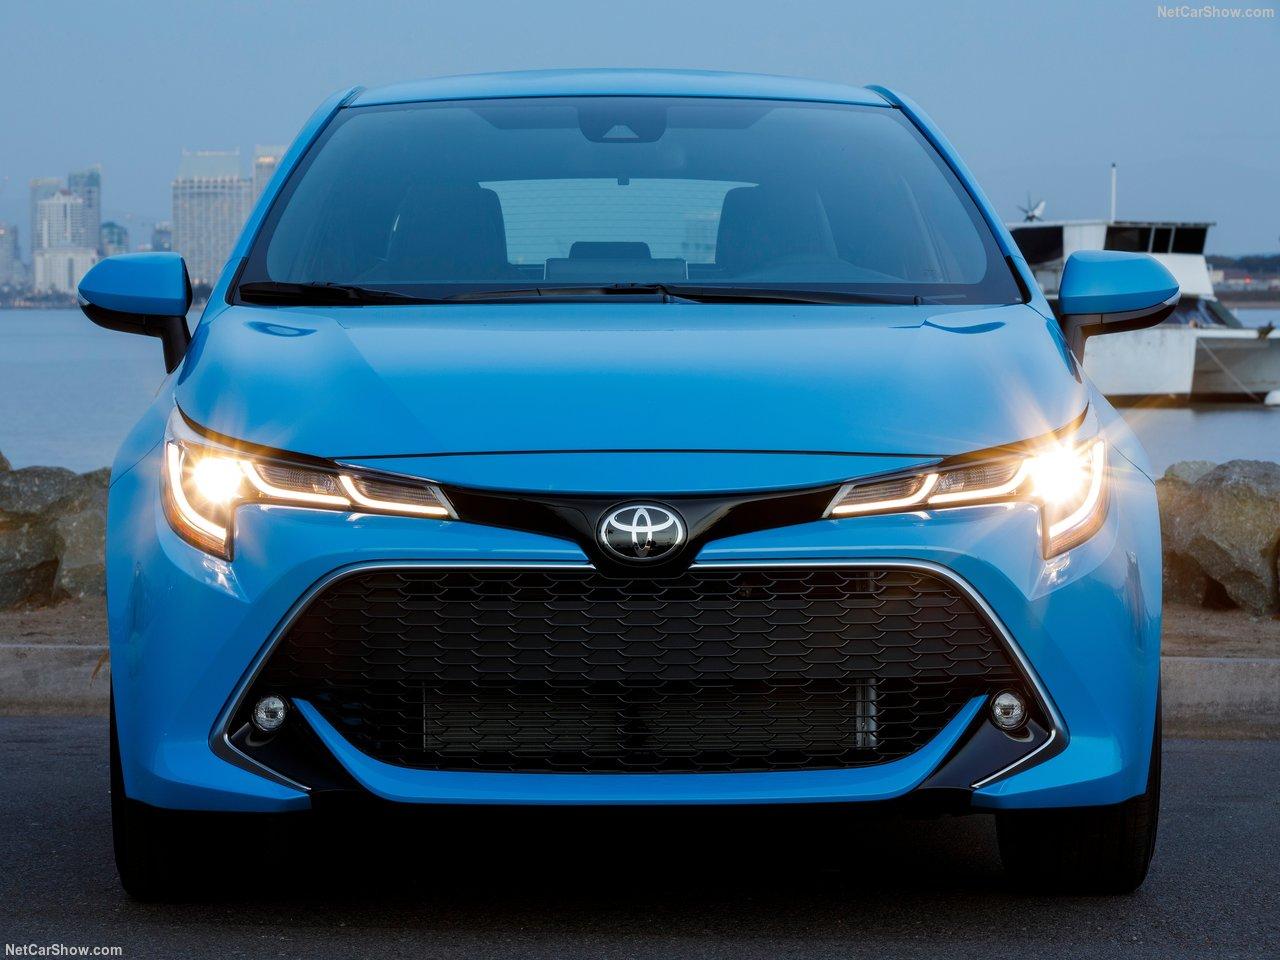 Toyota-Corolla_Hatchback-2019-1280-20.jpg